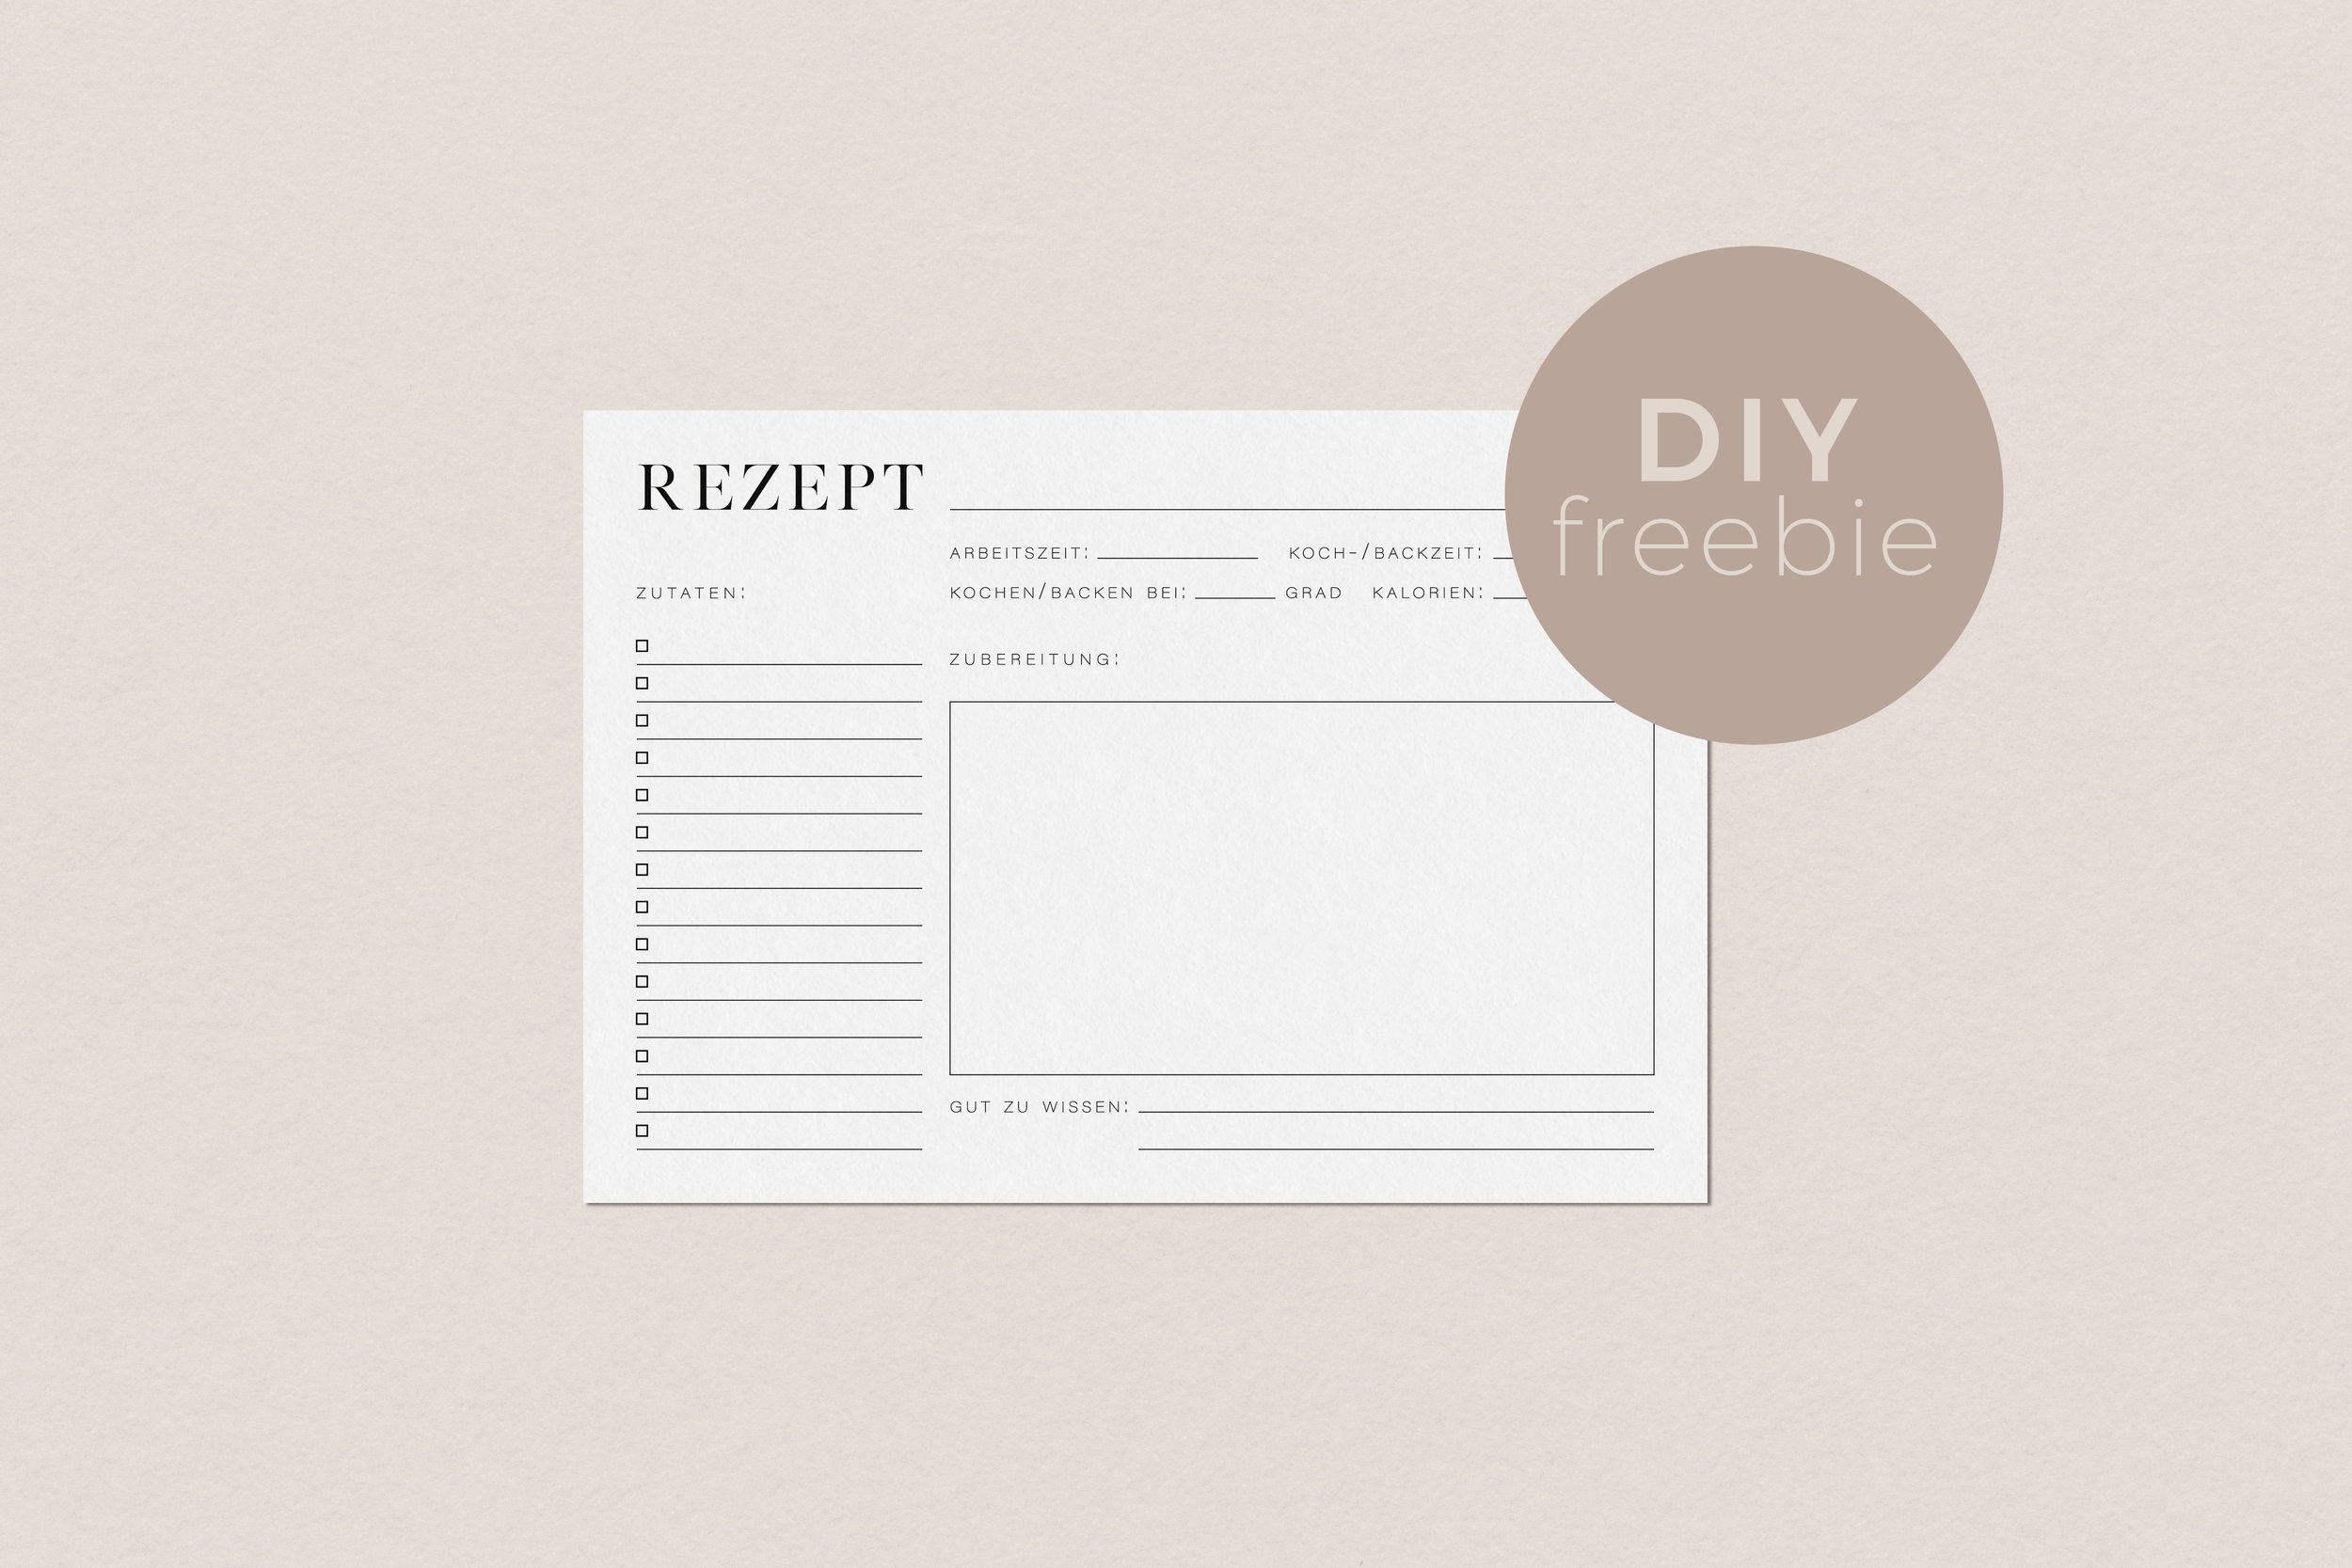 Rezeptkarte Din A5_Blog_DIY.jpg